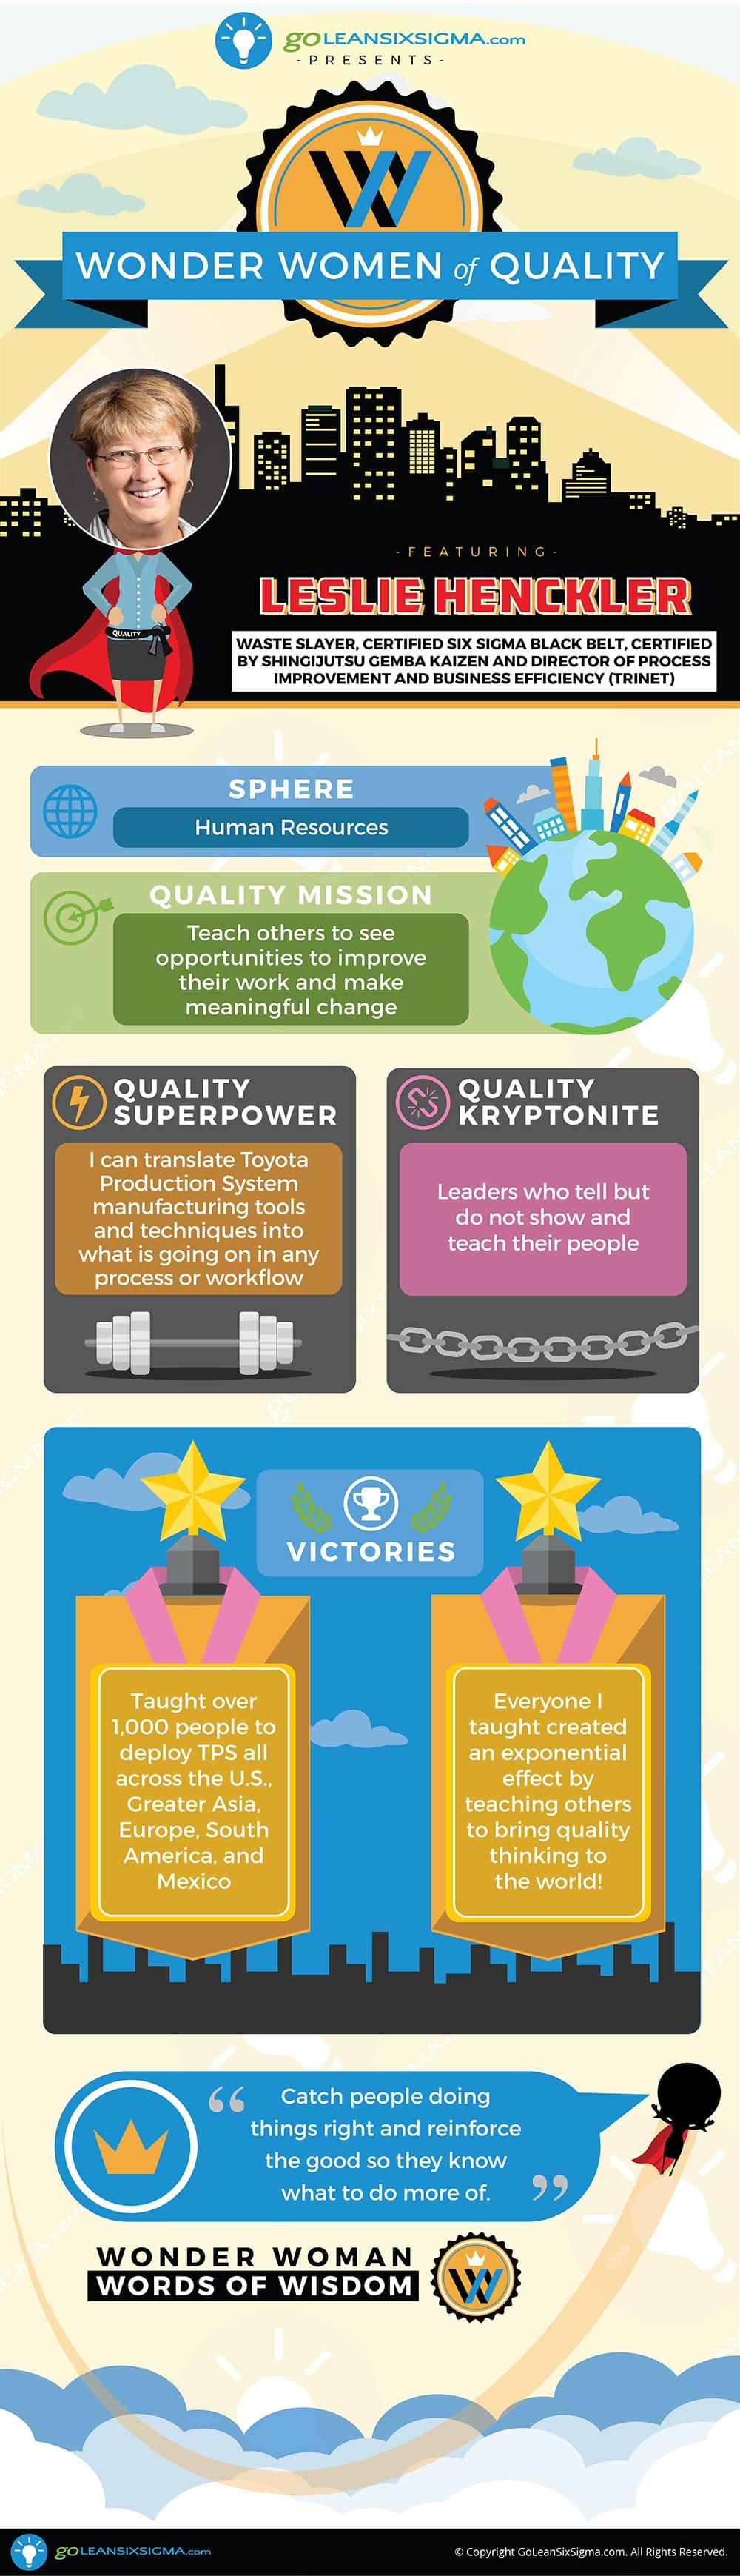 Wonder Women of Quality: Leslie Henckler - GoLeanSixSigma.com